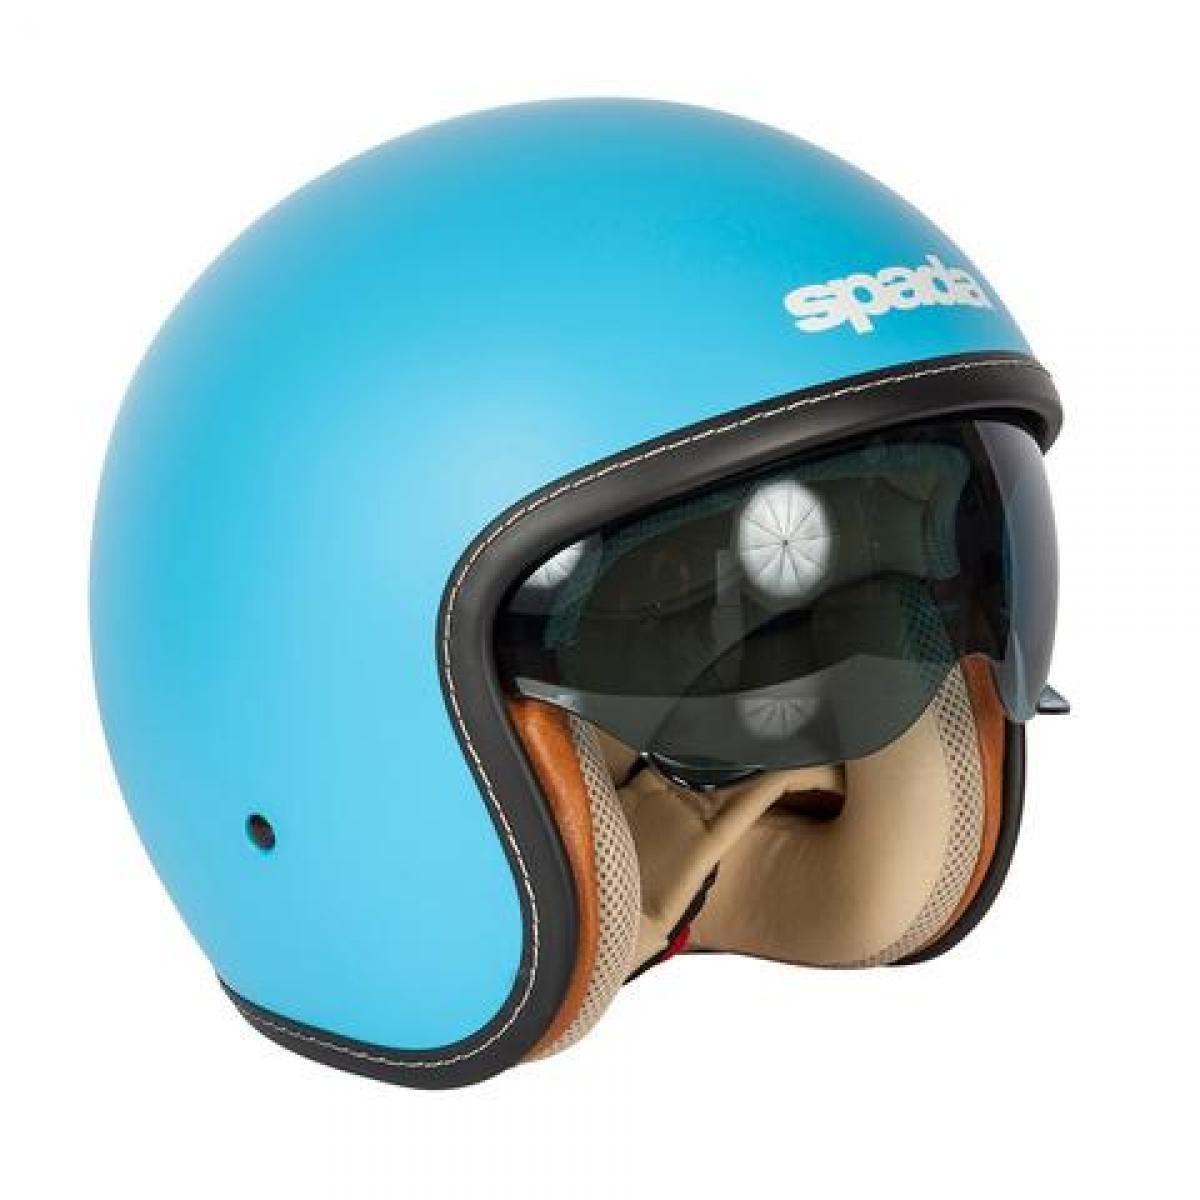 Spada-Raze-Ouvert-Casque-Bleu-Integre-Visiere miniature 12